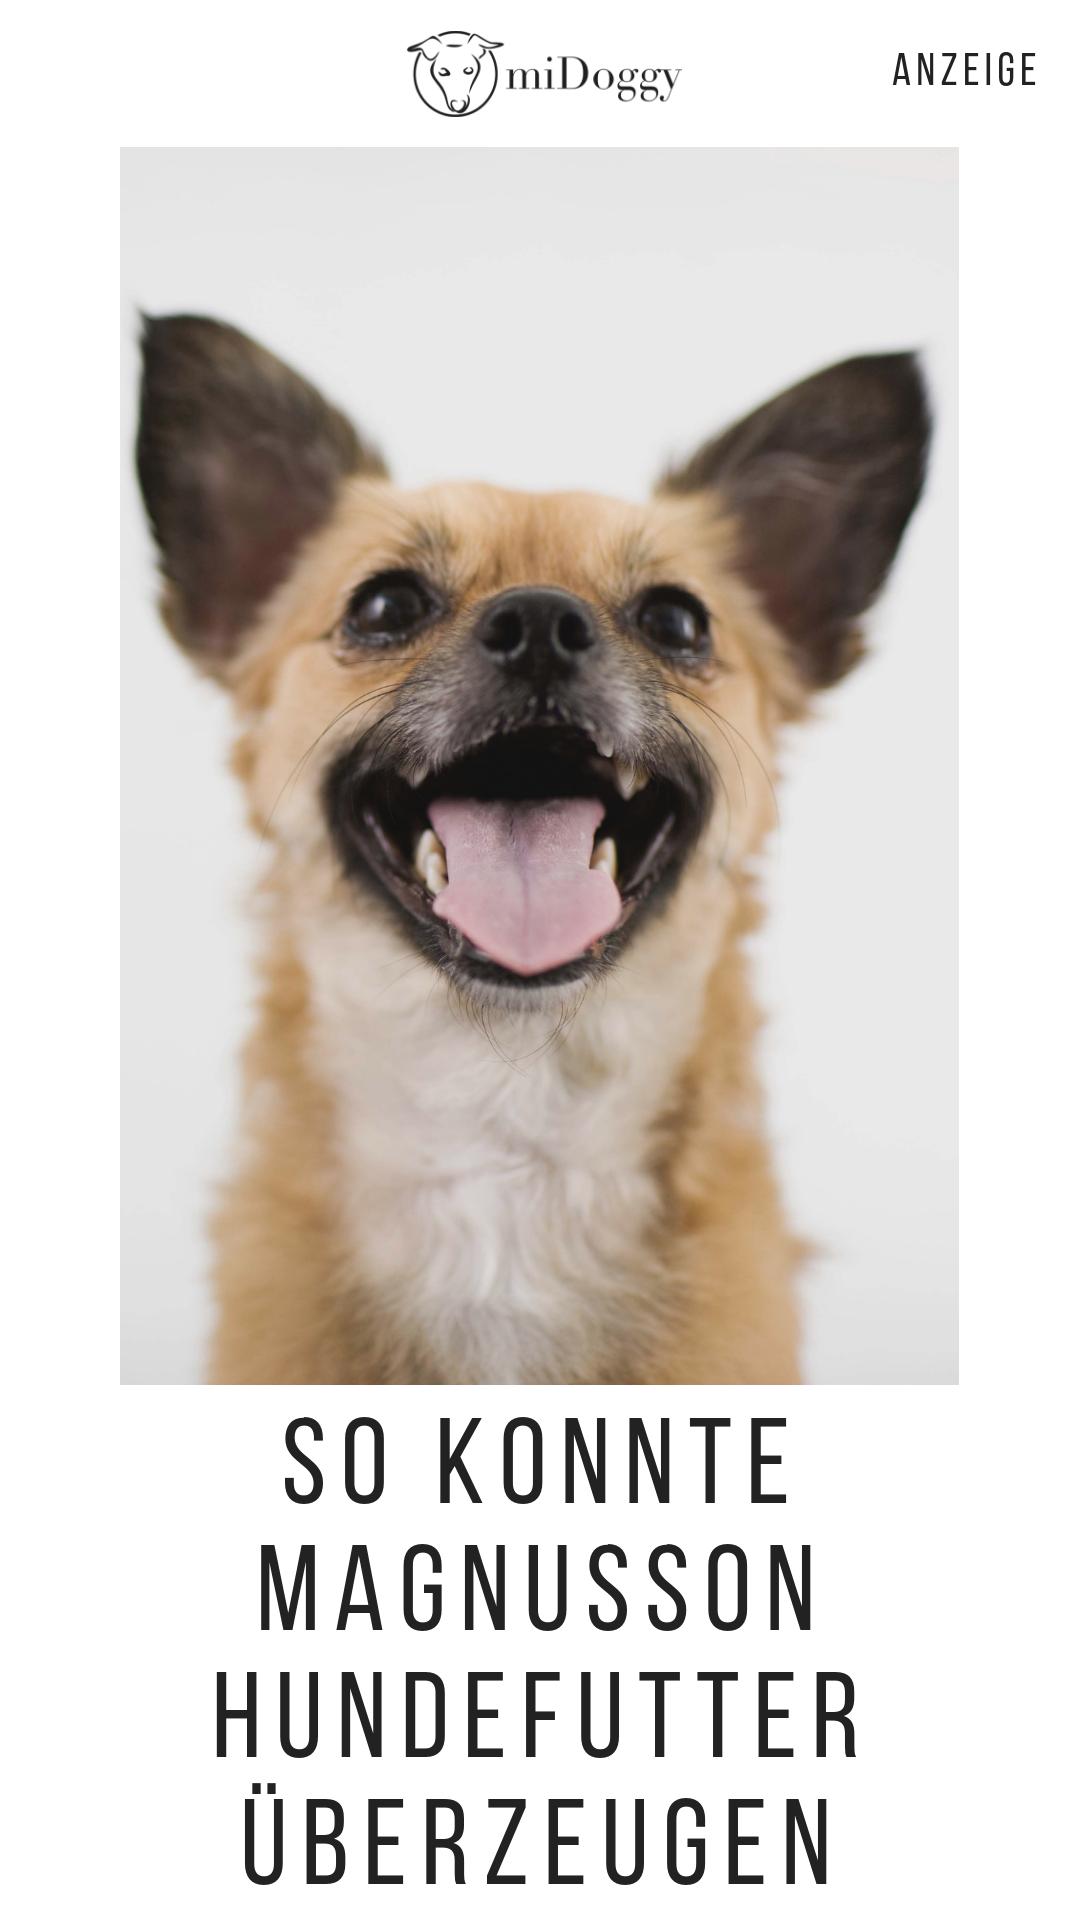 Lilla Hat Magnusson Organic Getestet Werbung Hunde